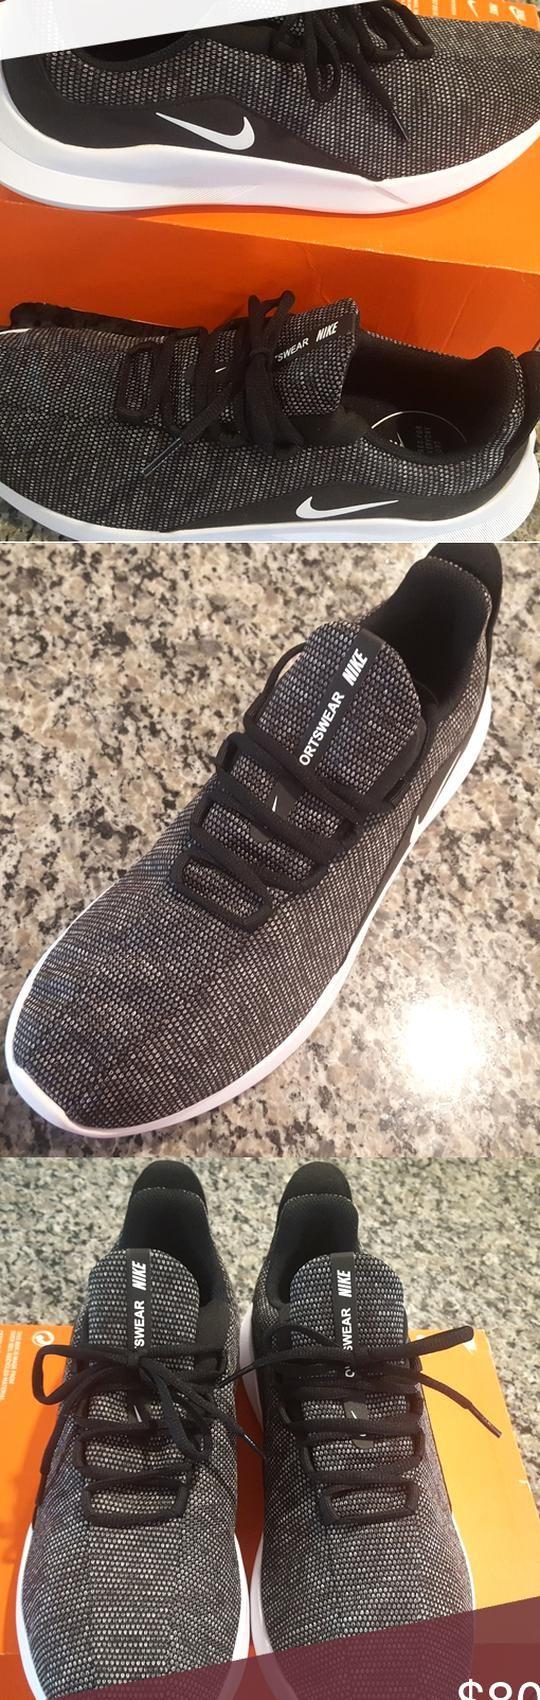 Nikes Mens Running Shoe Black Nikes Mens Shoes Sport Wear ...